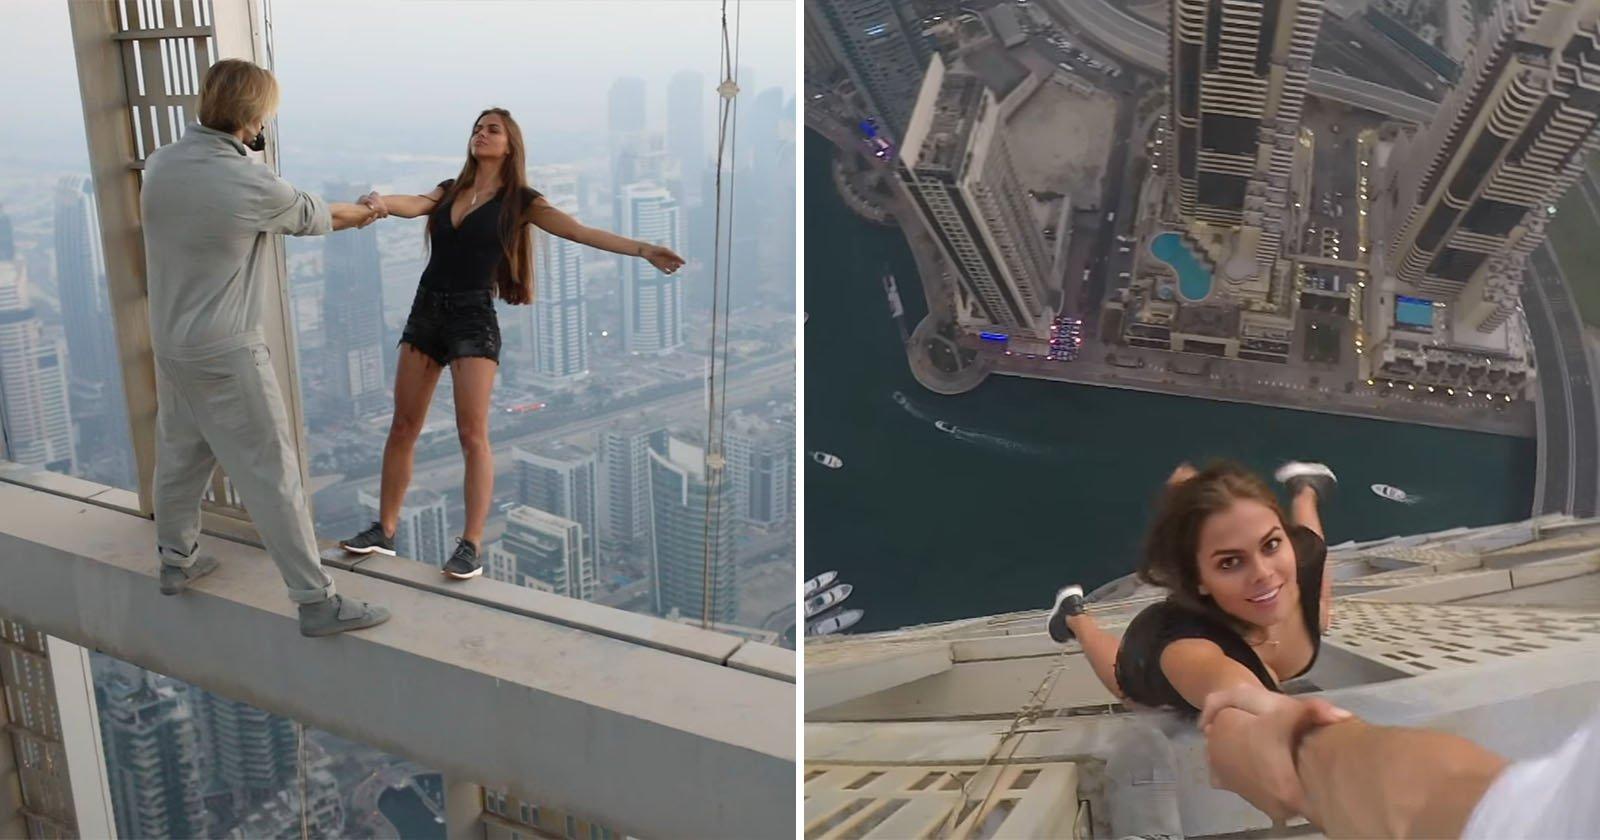 model dangled off 1000ft skyscraper for reckless photo shoot